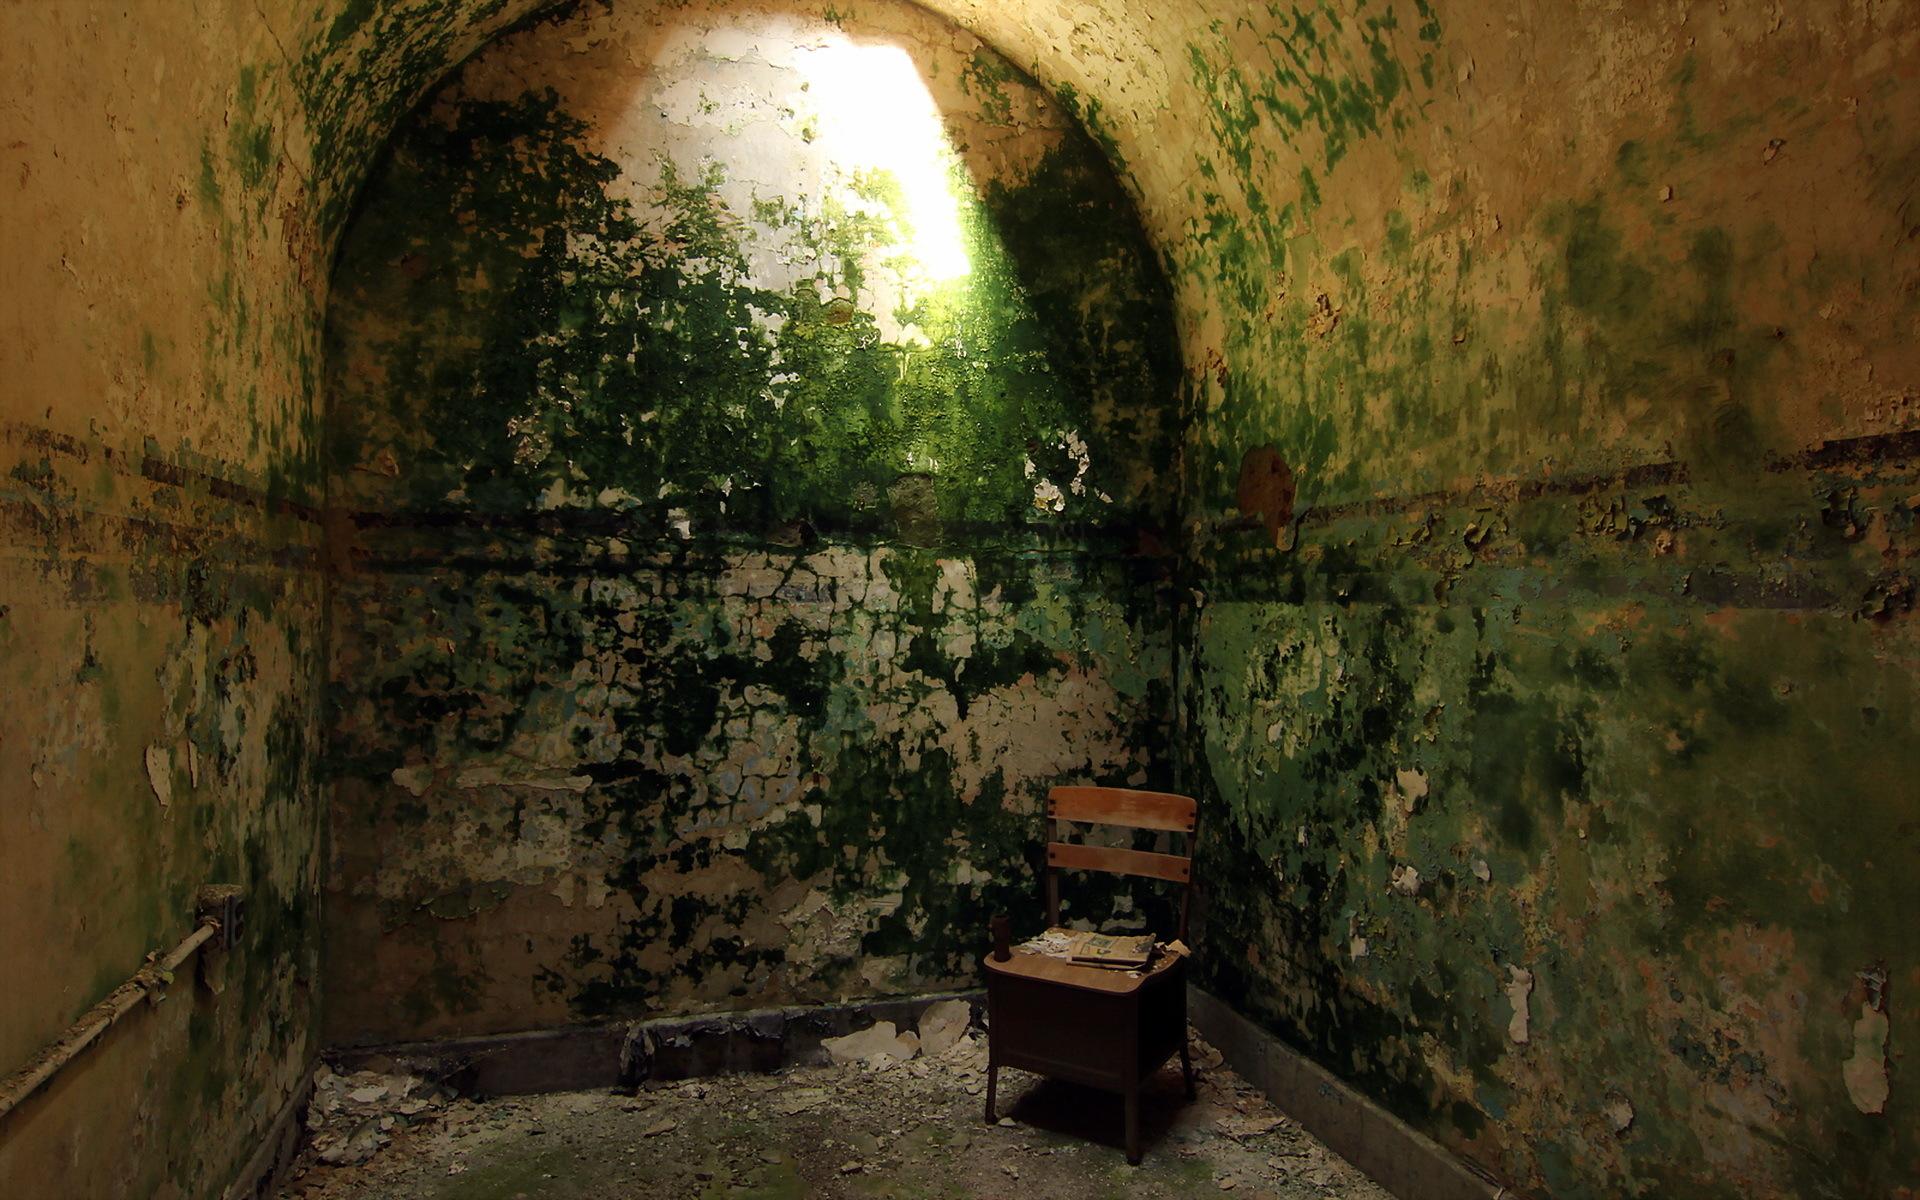 Wallpaper prison cell interior wallpapers interior   download 1920x1200